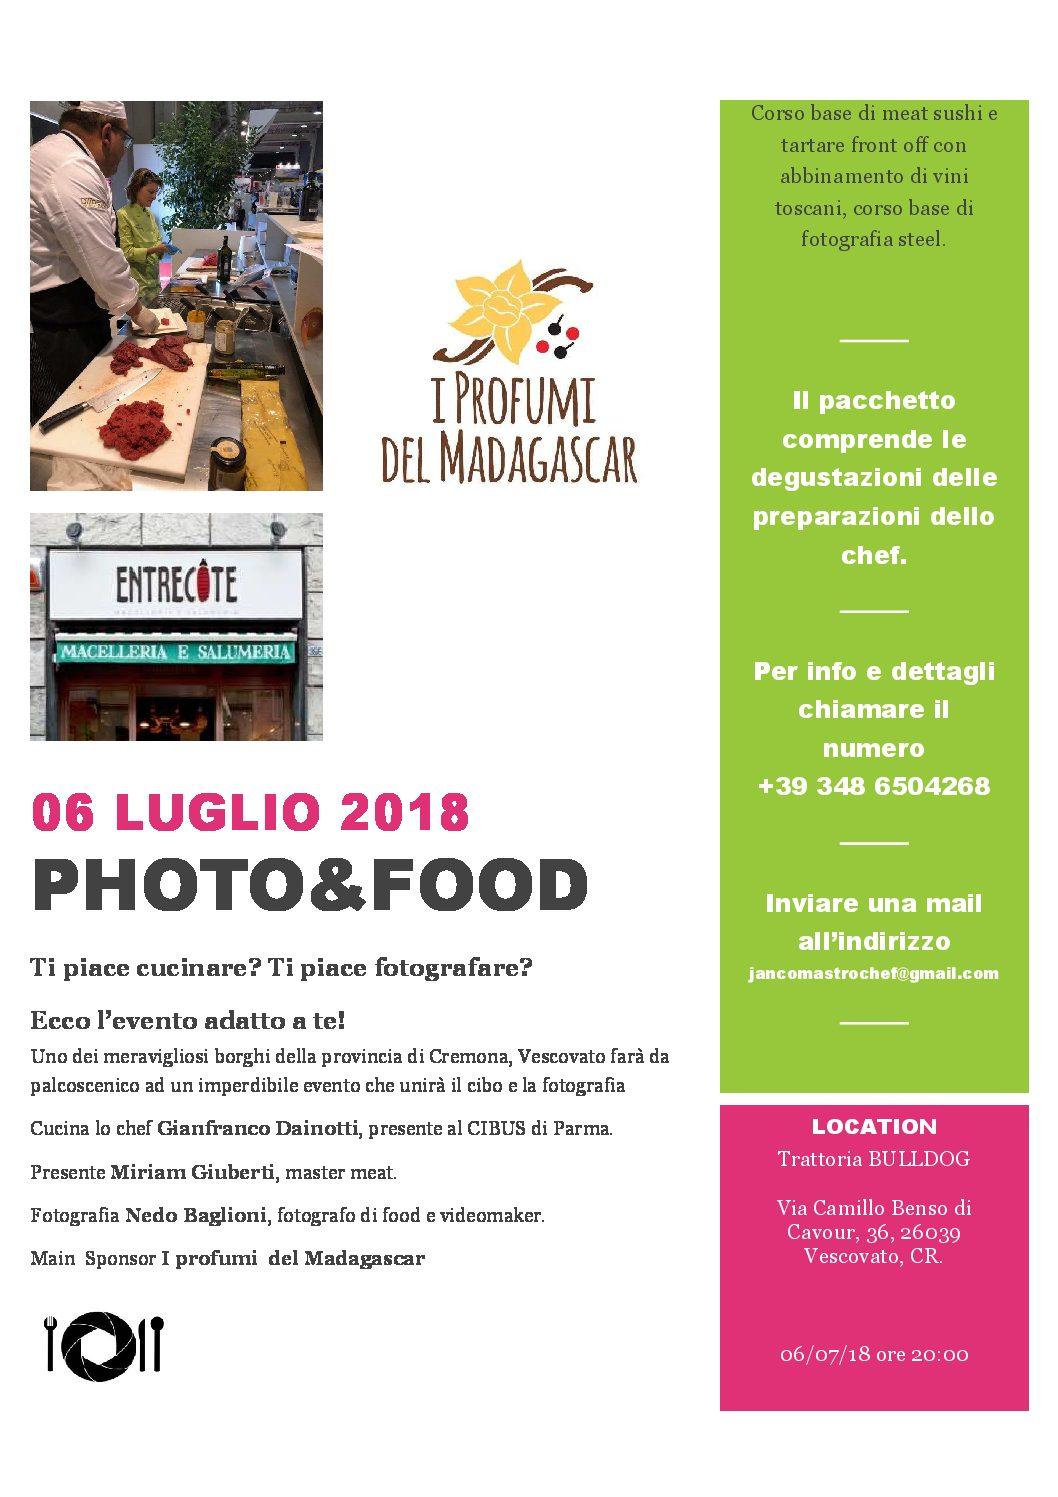 PHOTO & FOOD – 6 Luglio 2018